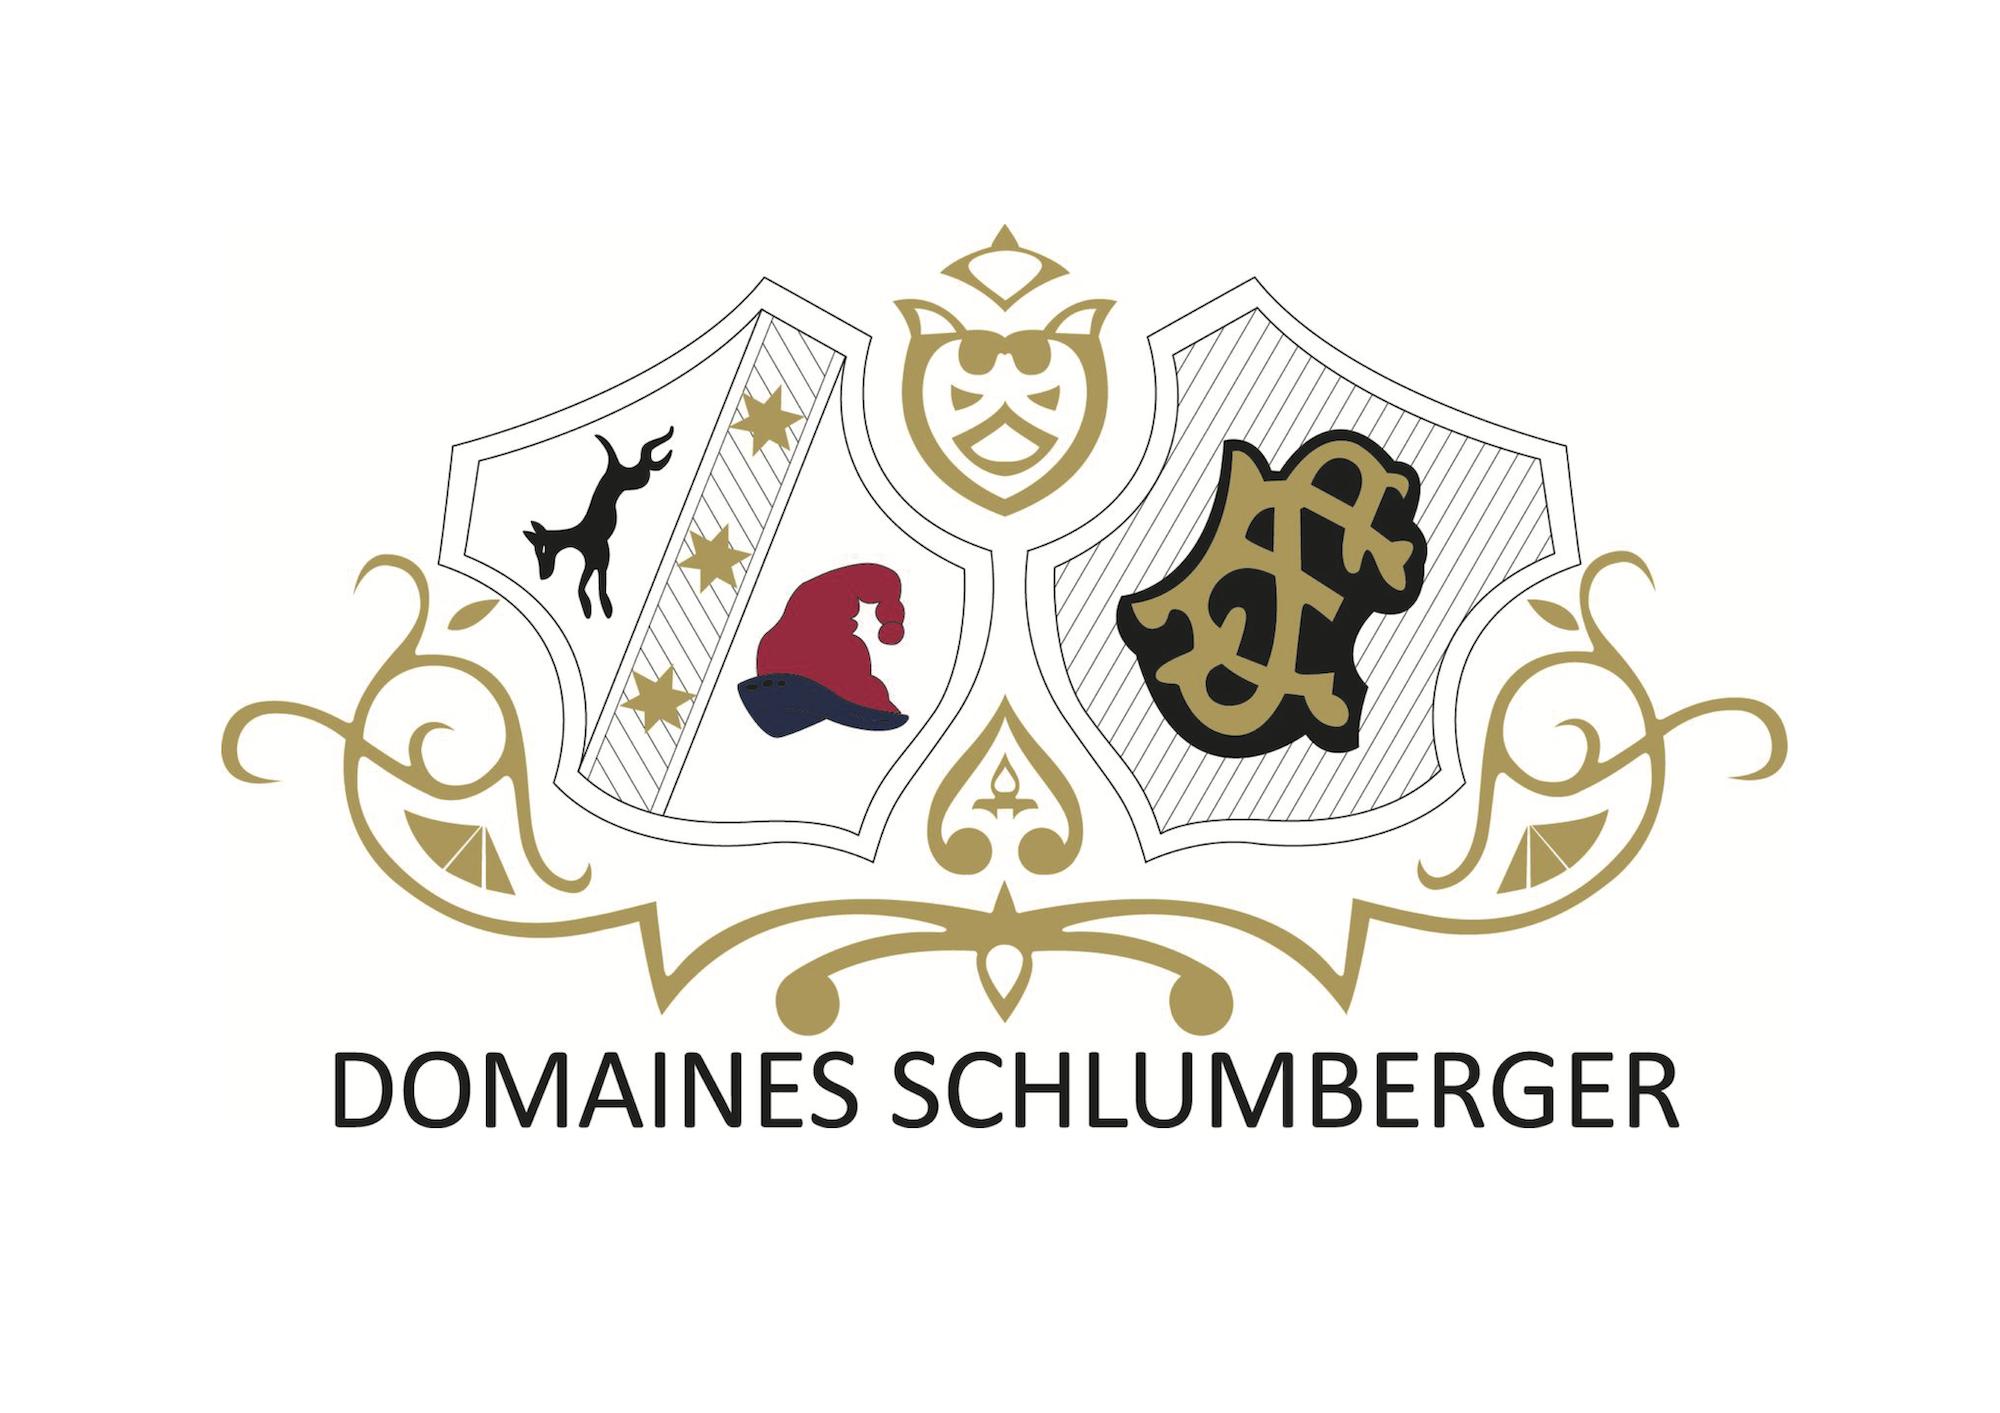 Domaines Schlumberger